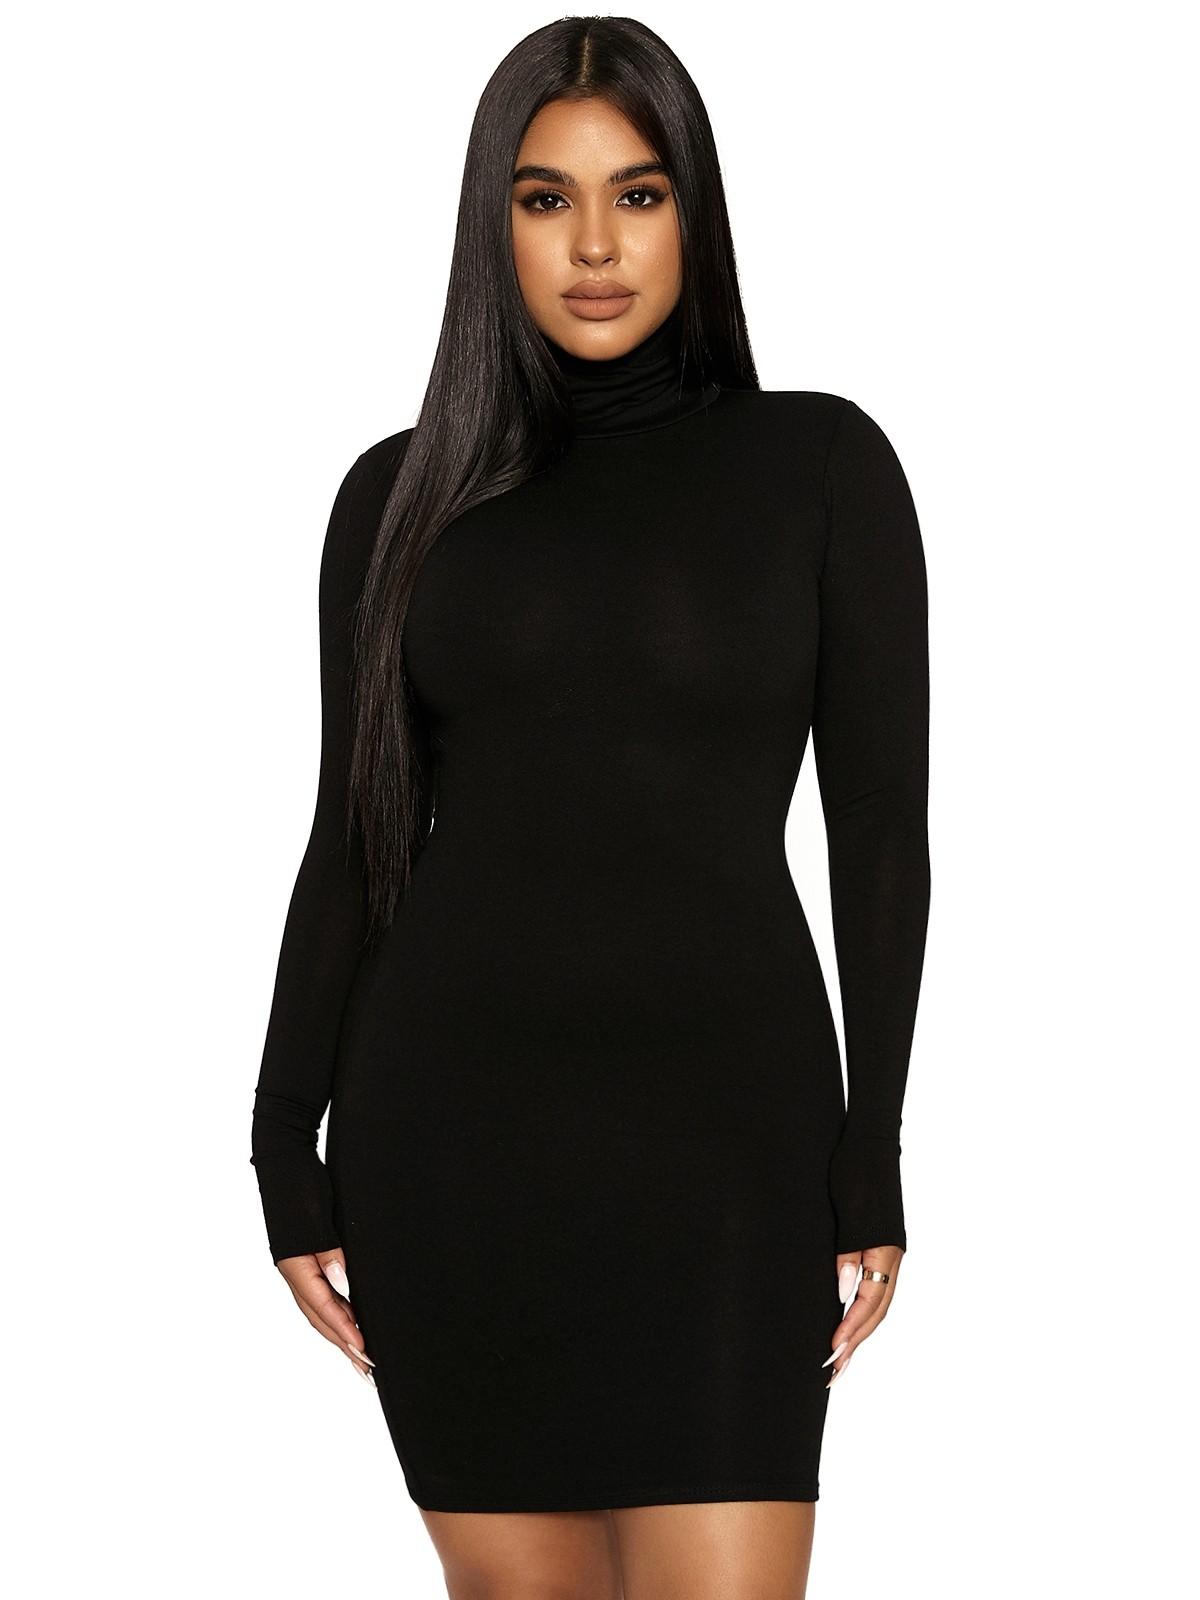 The NW Turtleneck Mini Dress by Naked Wardrobe, available on nakedwardrobe.com for $42 Kylie Jenner Dress SIMILAR PRODUCT